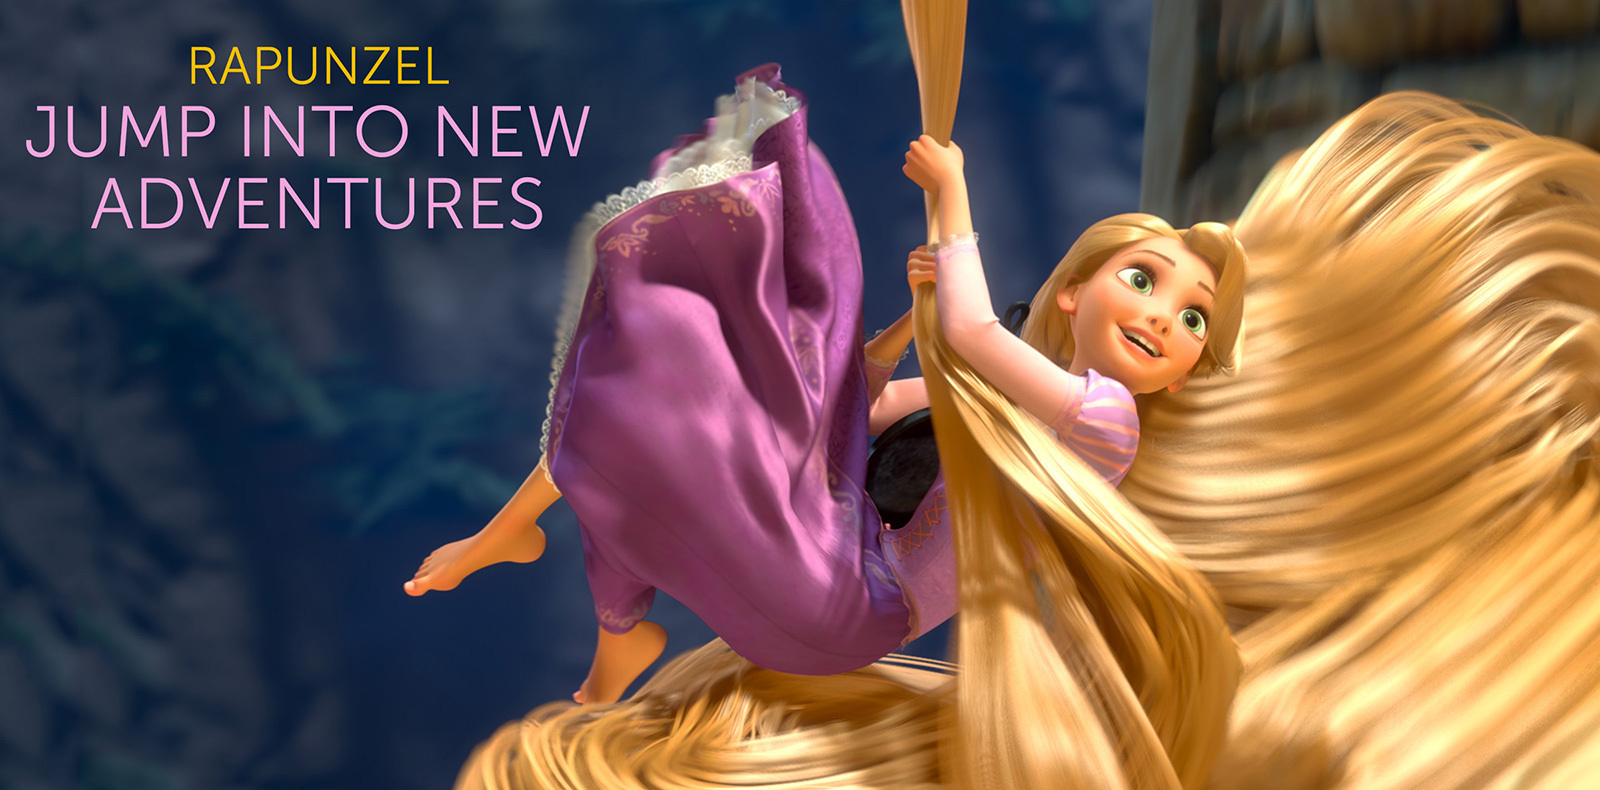 Princess AU - Rapunzel MOVIE ART 1